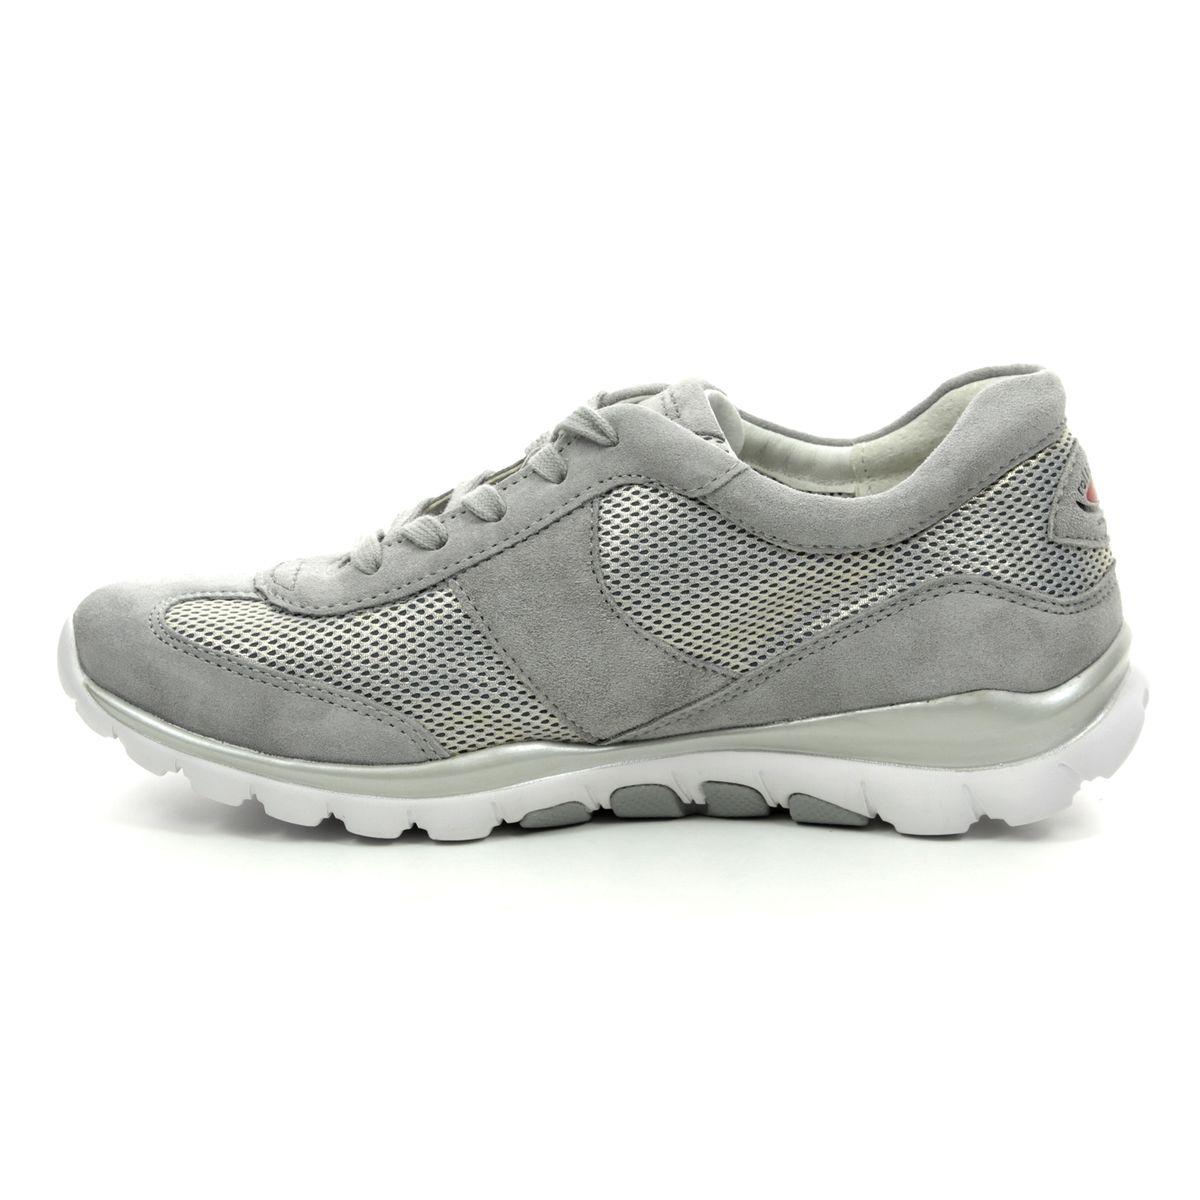 Gabor Helen 46.966.39 Grey multi trainers